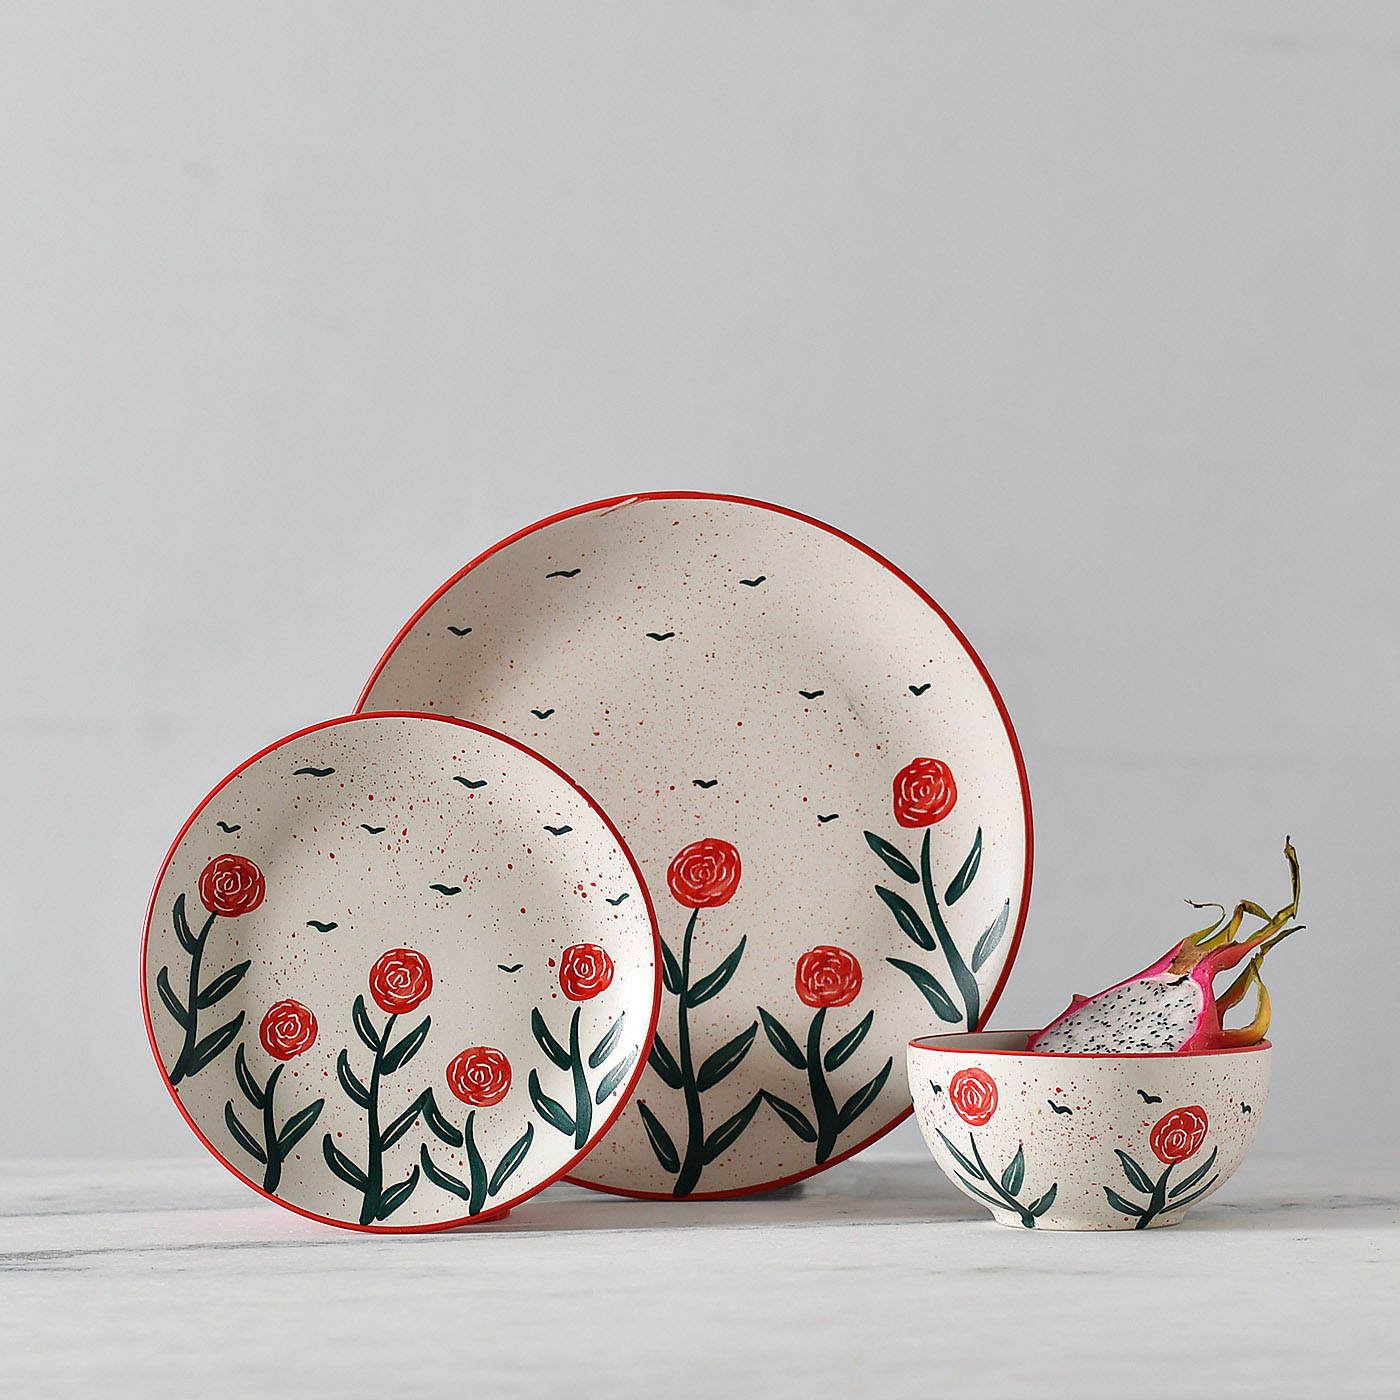 Unique Handmade Gifting Ideas